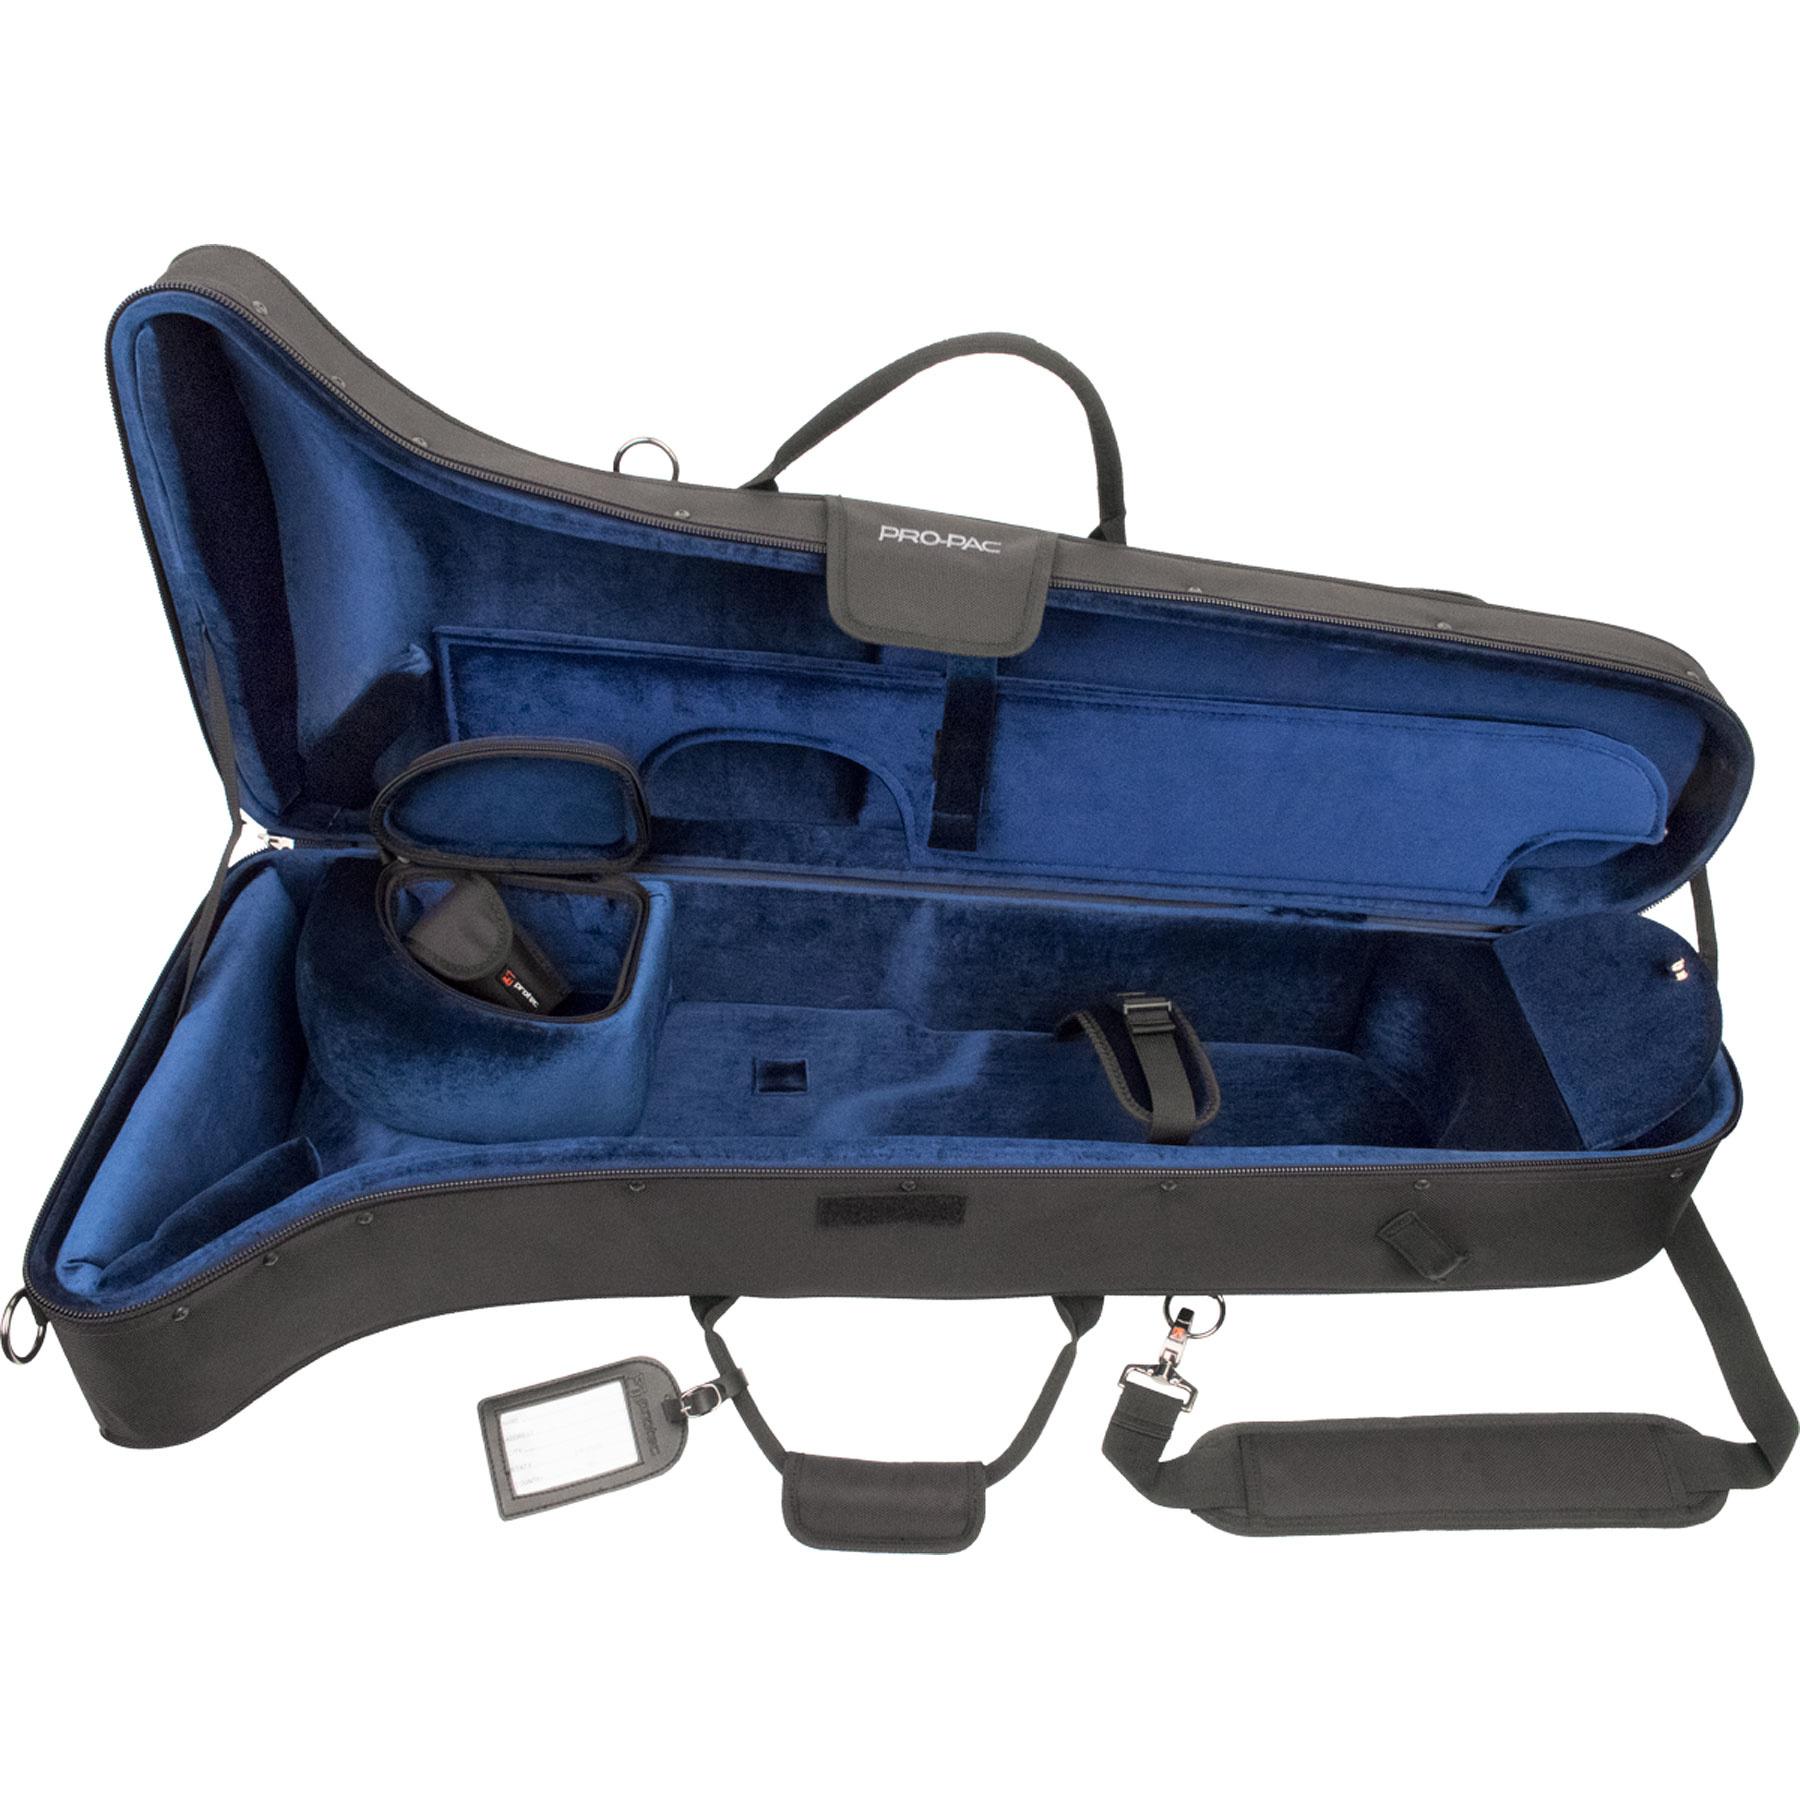 Protec Protec Pro Pac Bass Trombone Case